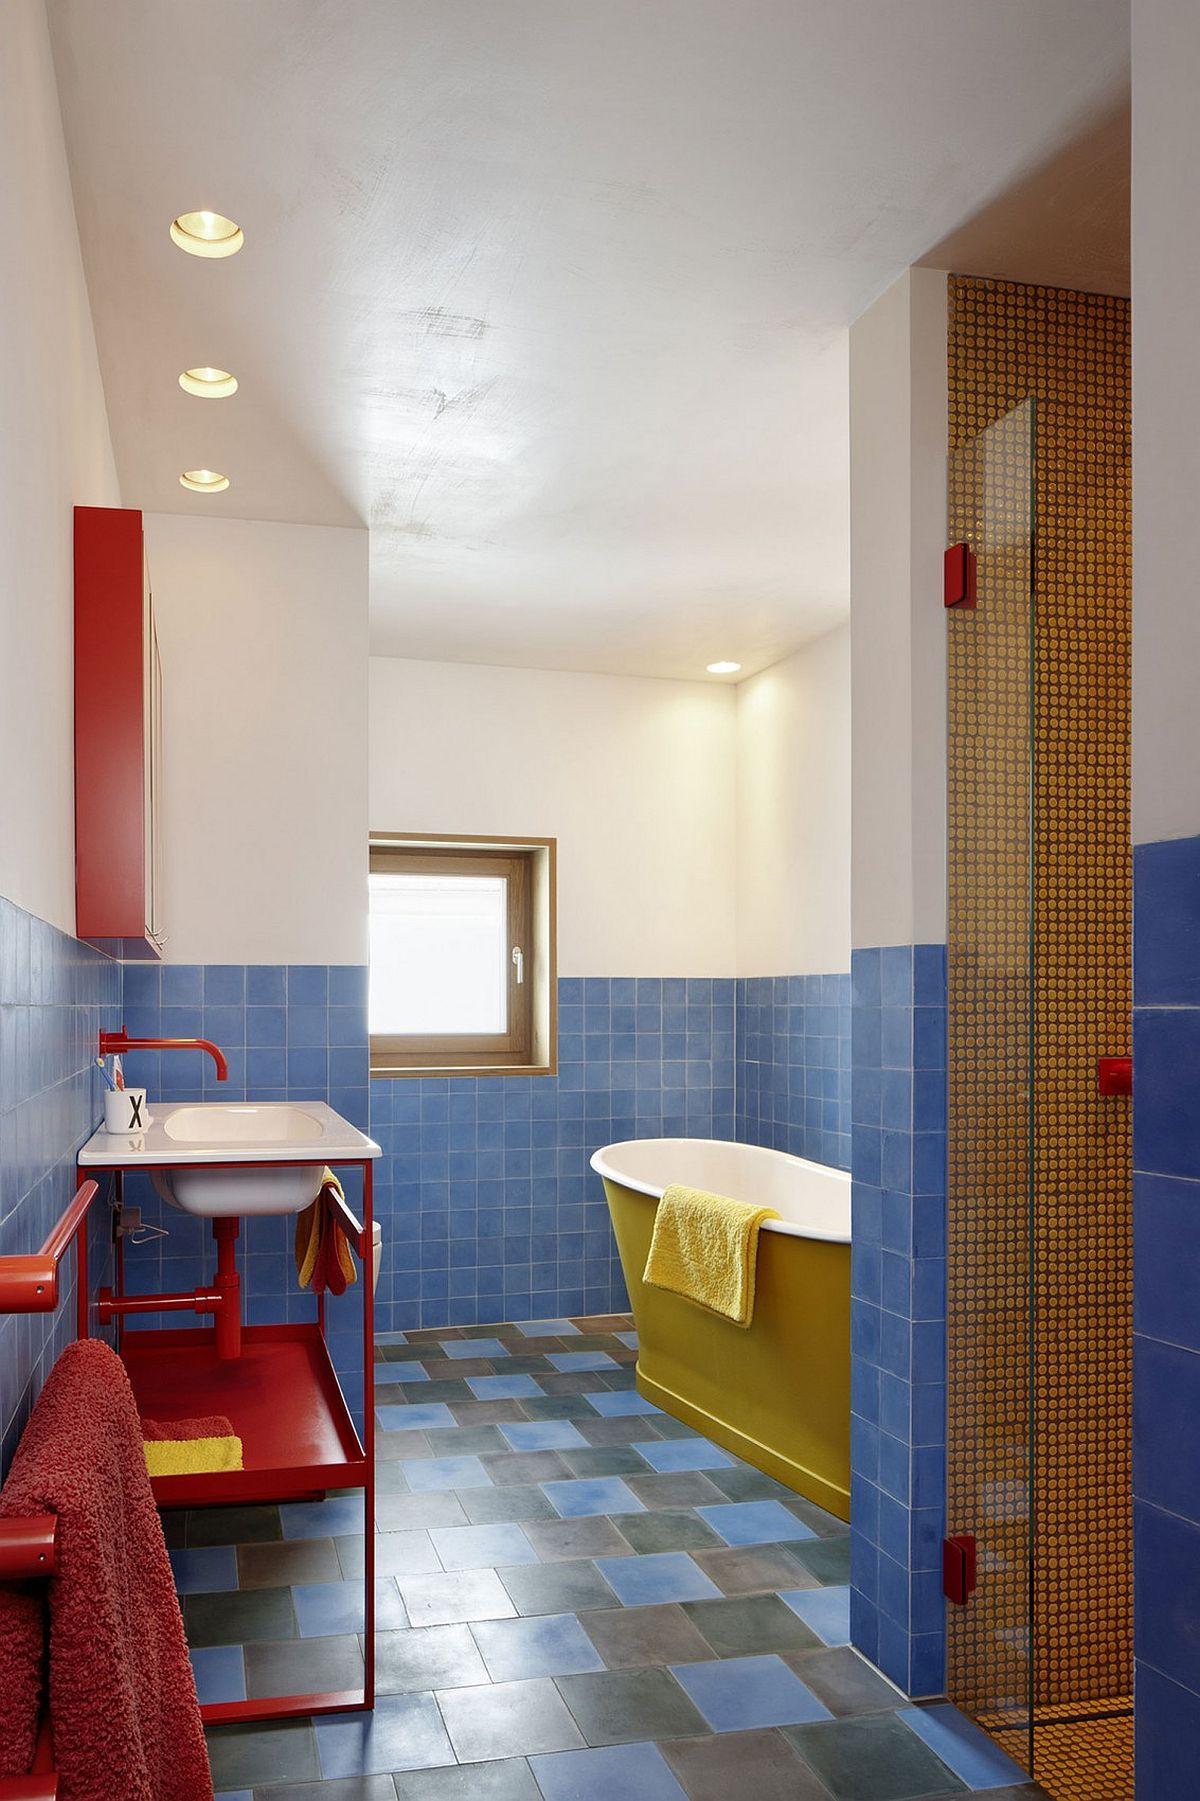 Colorful modern bathroom with standalone bathtub in yellow